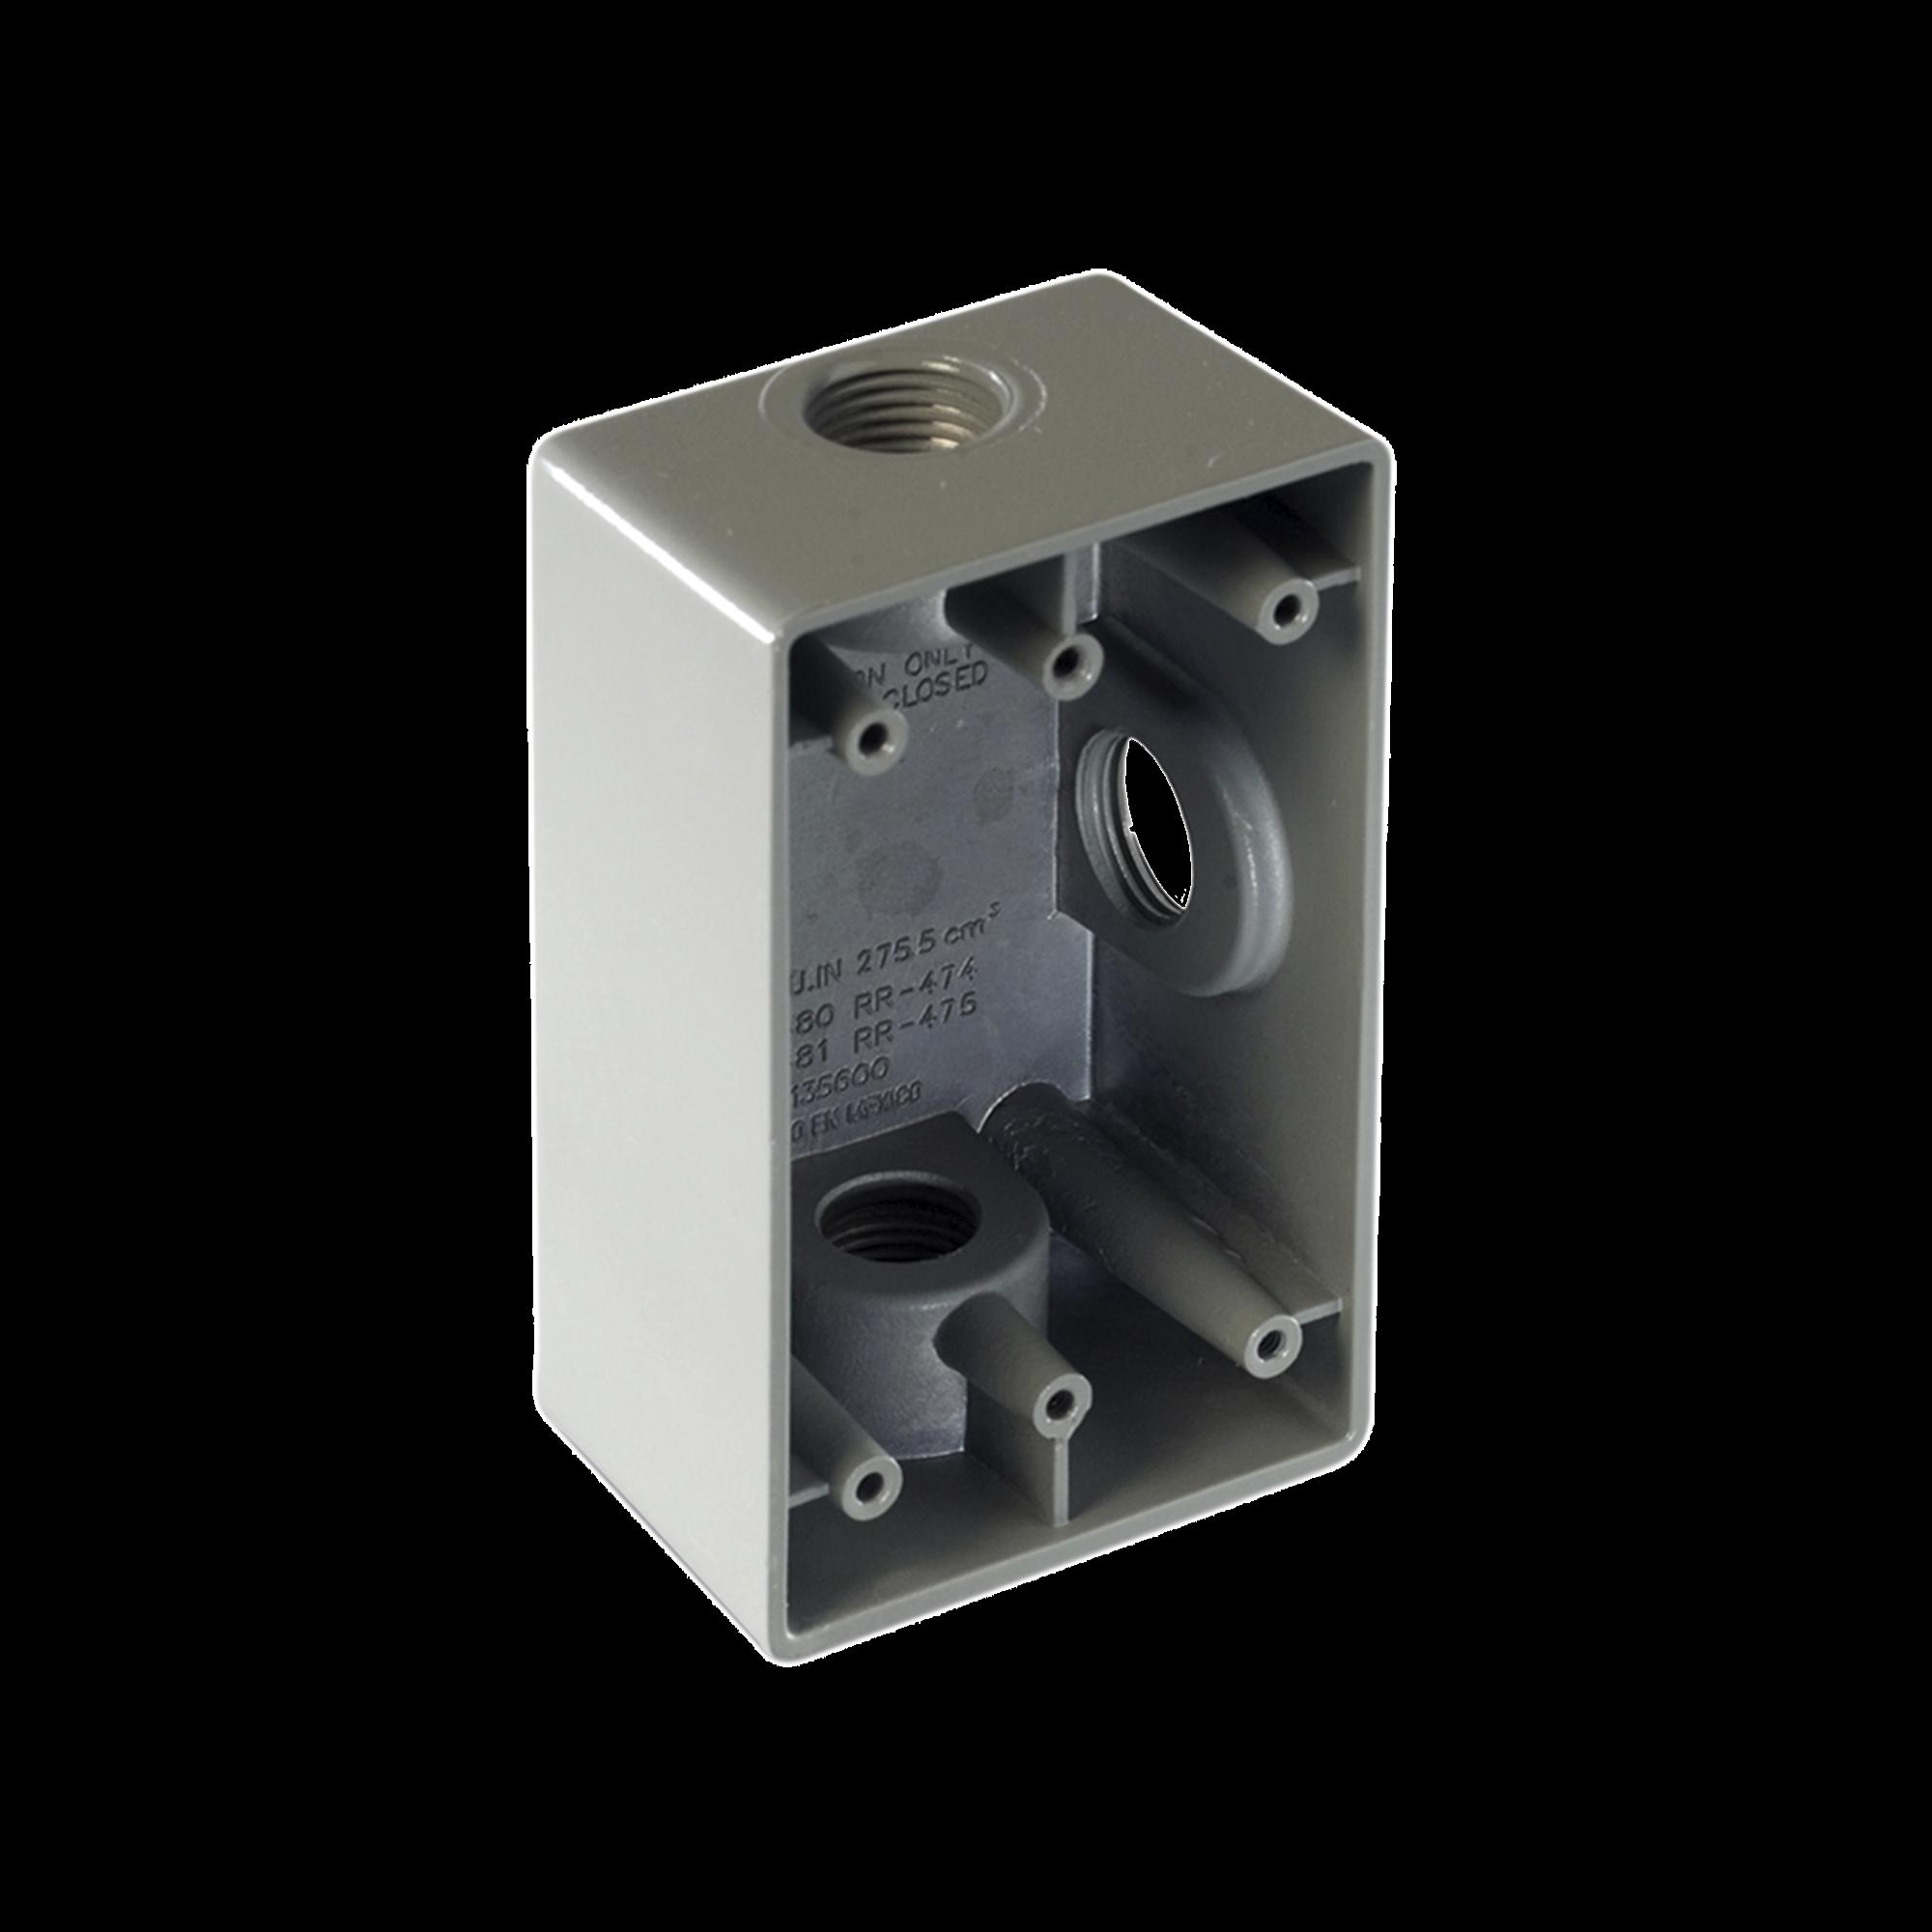 Caja Condulet FS de 1 ( 25.4 mm) con tres bocas a prueba de intemperie.